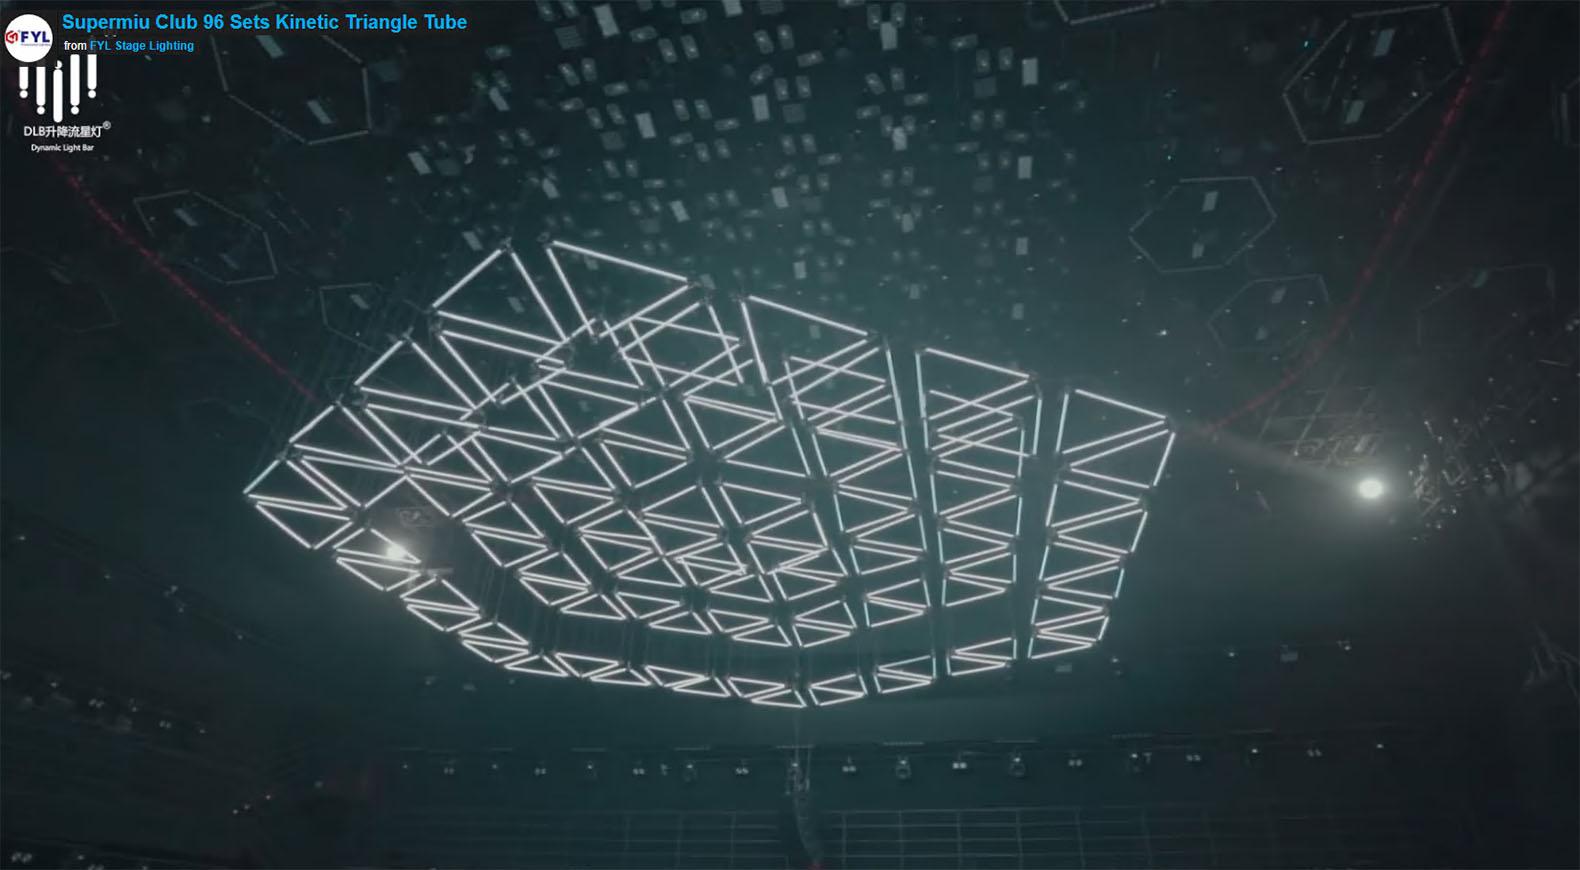 Supermiu Club 96 Sets Kinetic Triangle Tube